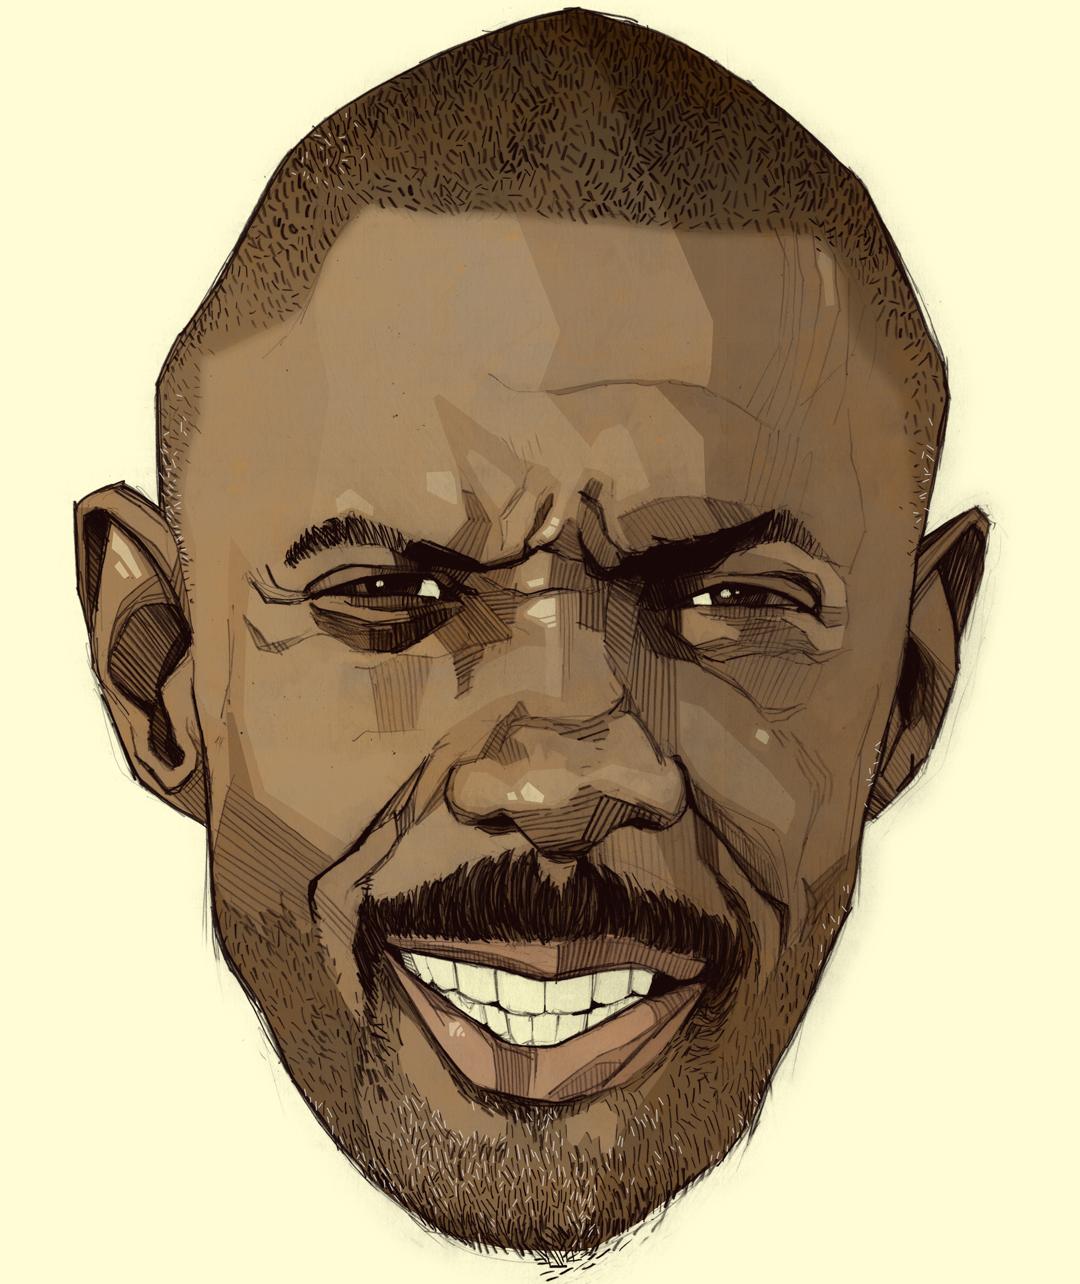 Idris Elba portrait